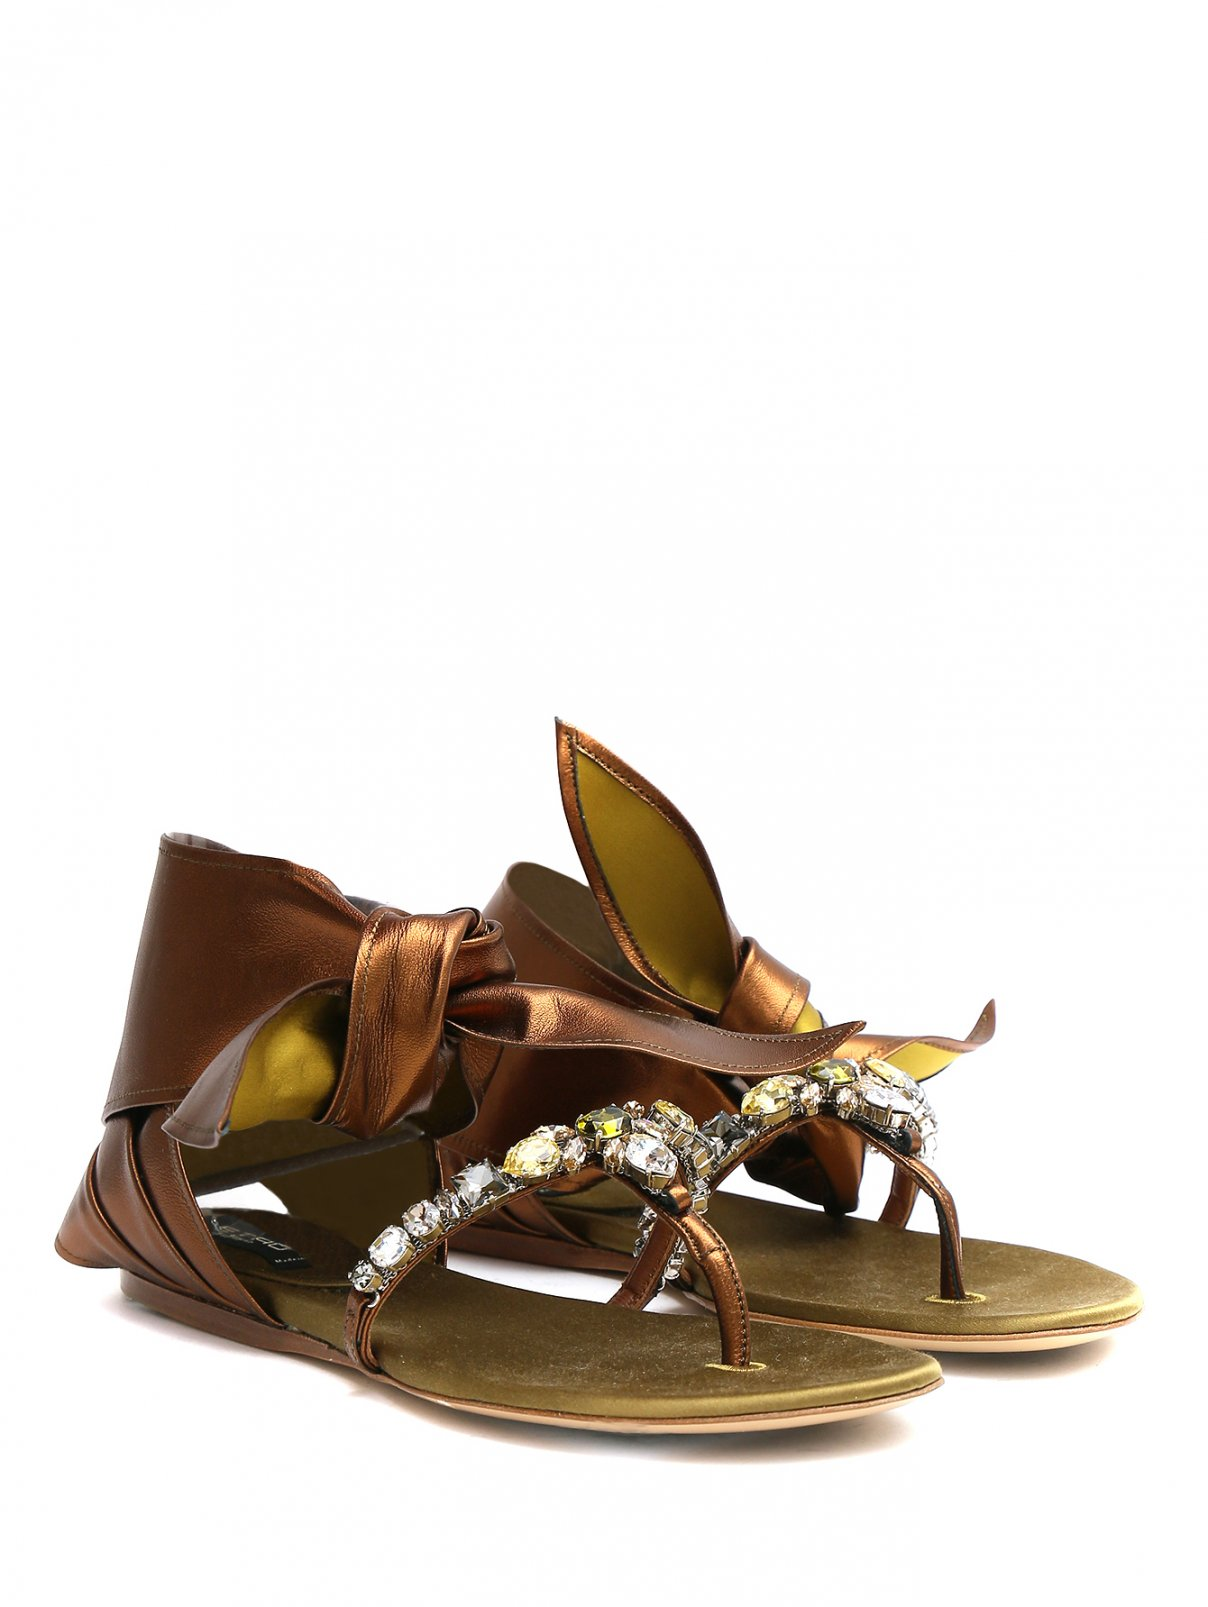 Сандалии из кожи металлик со стразами Etro  –  Общий вид  – Цвет:  Металлик